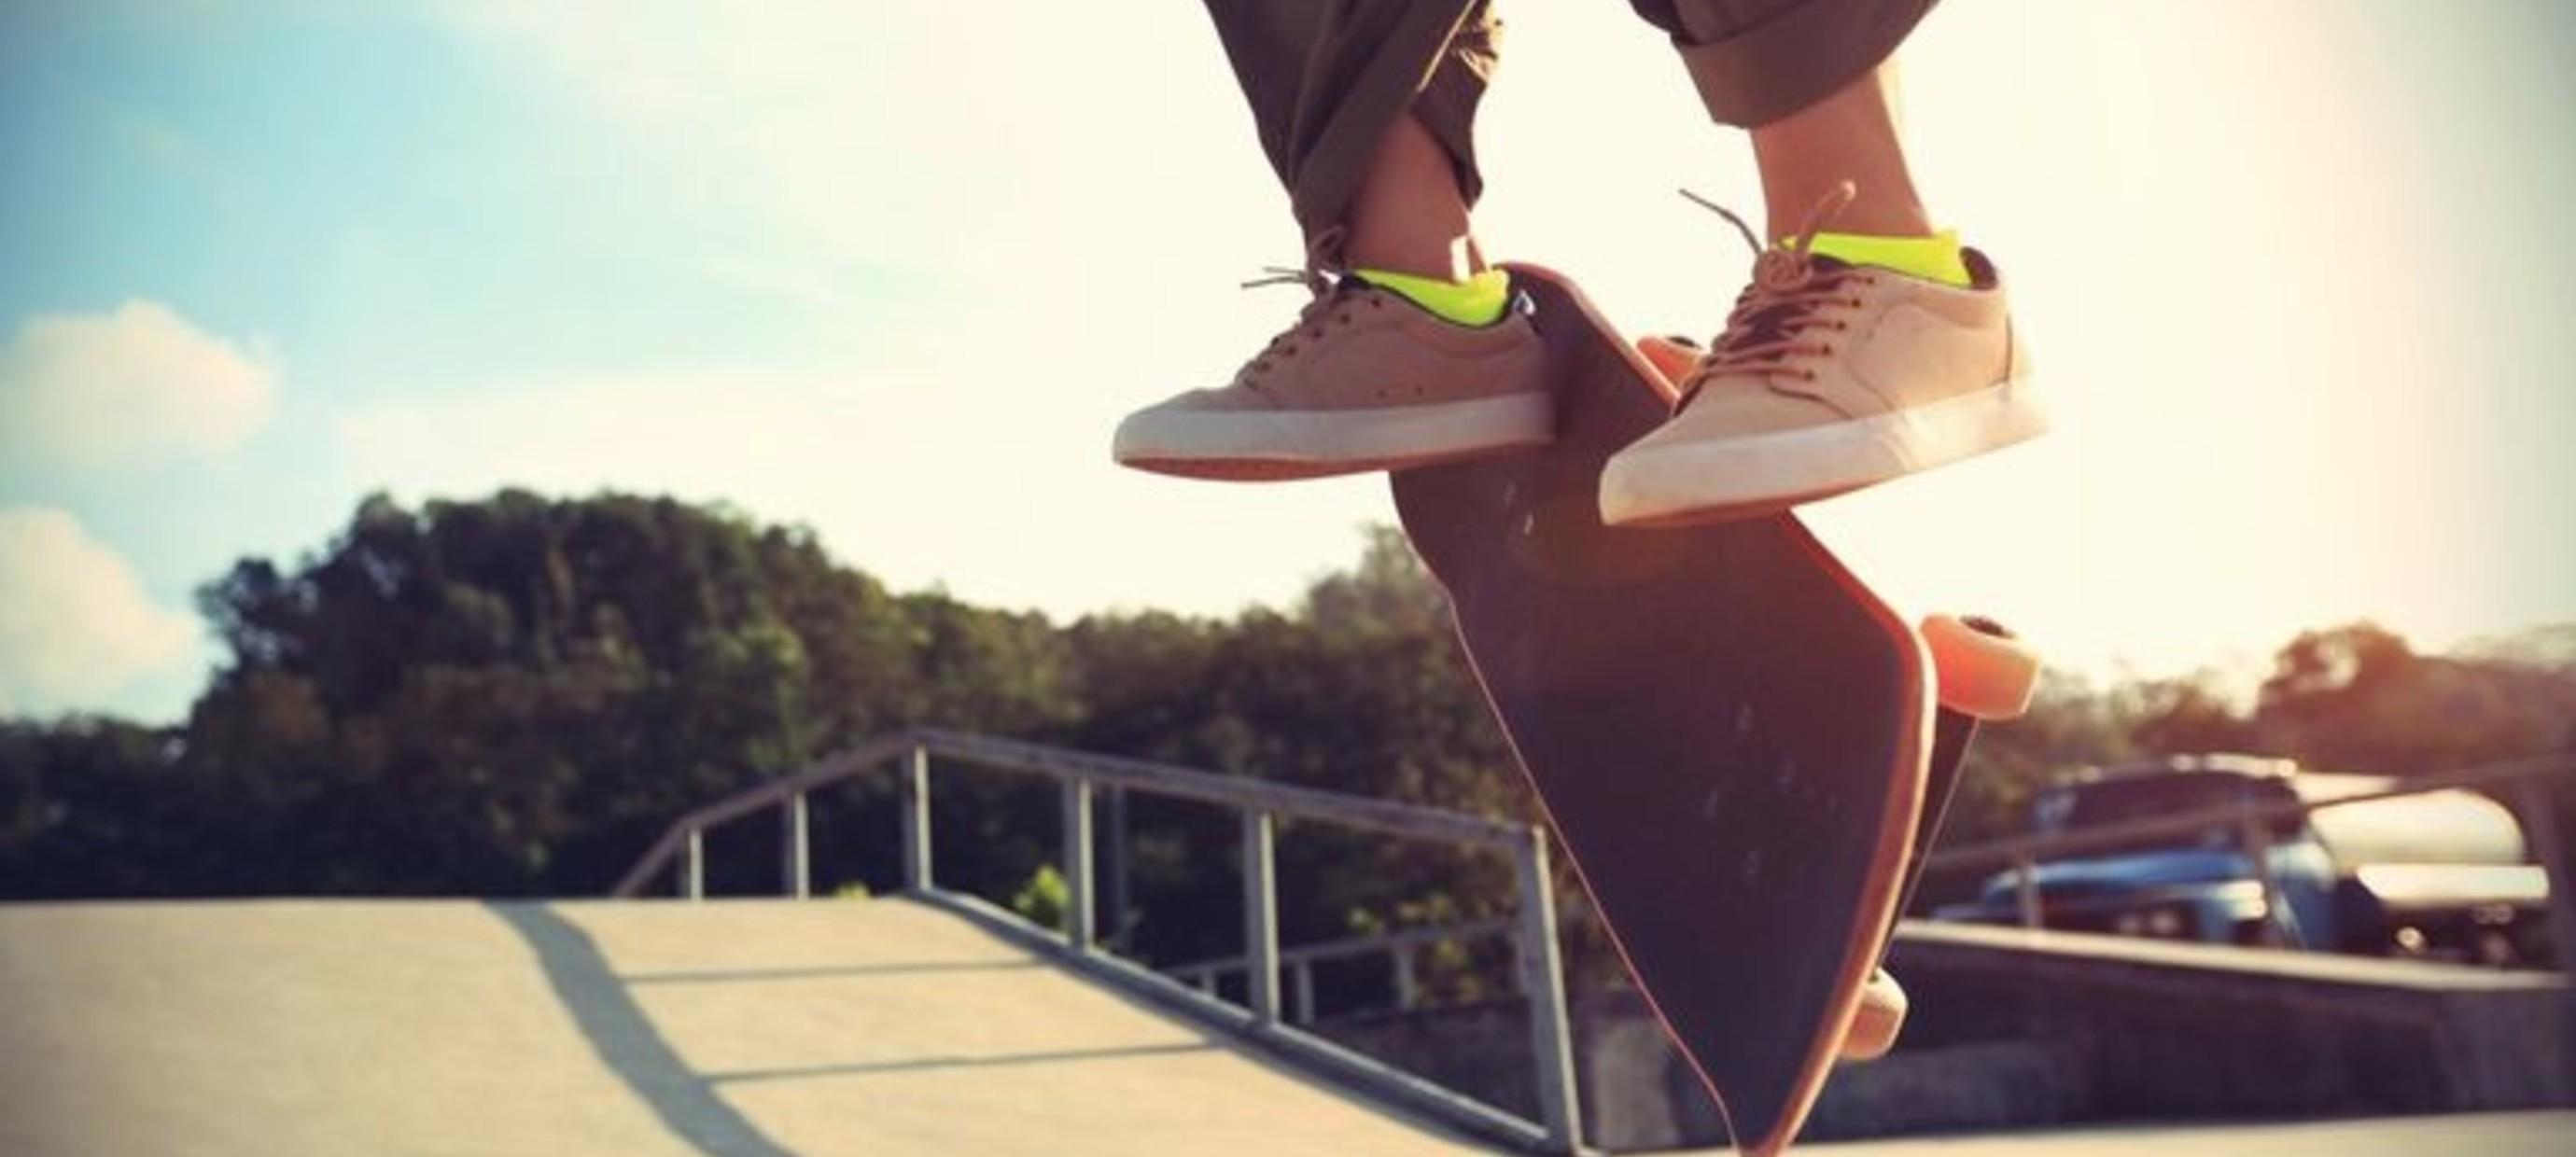 BHouse Trick Of The Week - The Heel Flip